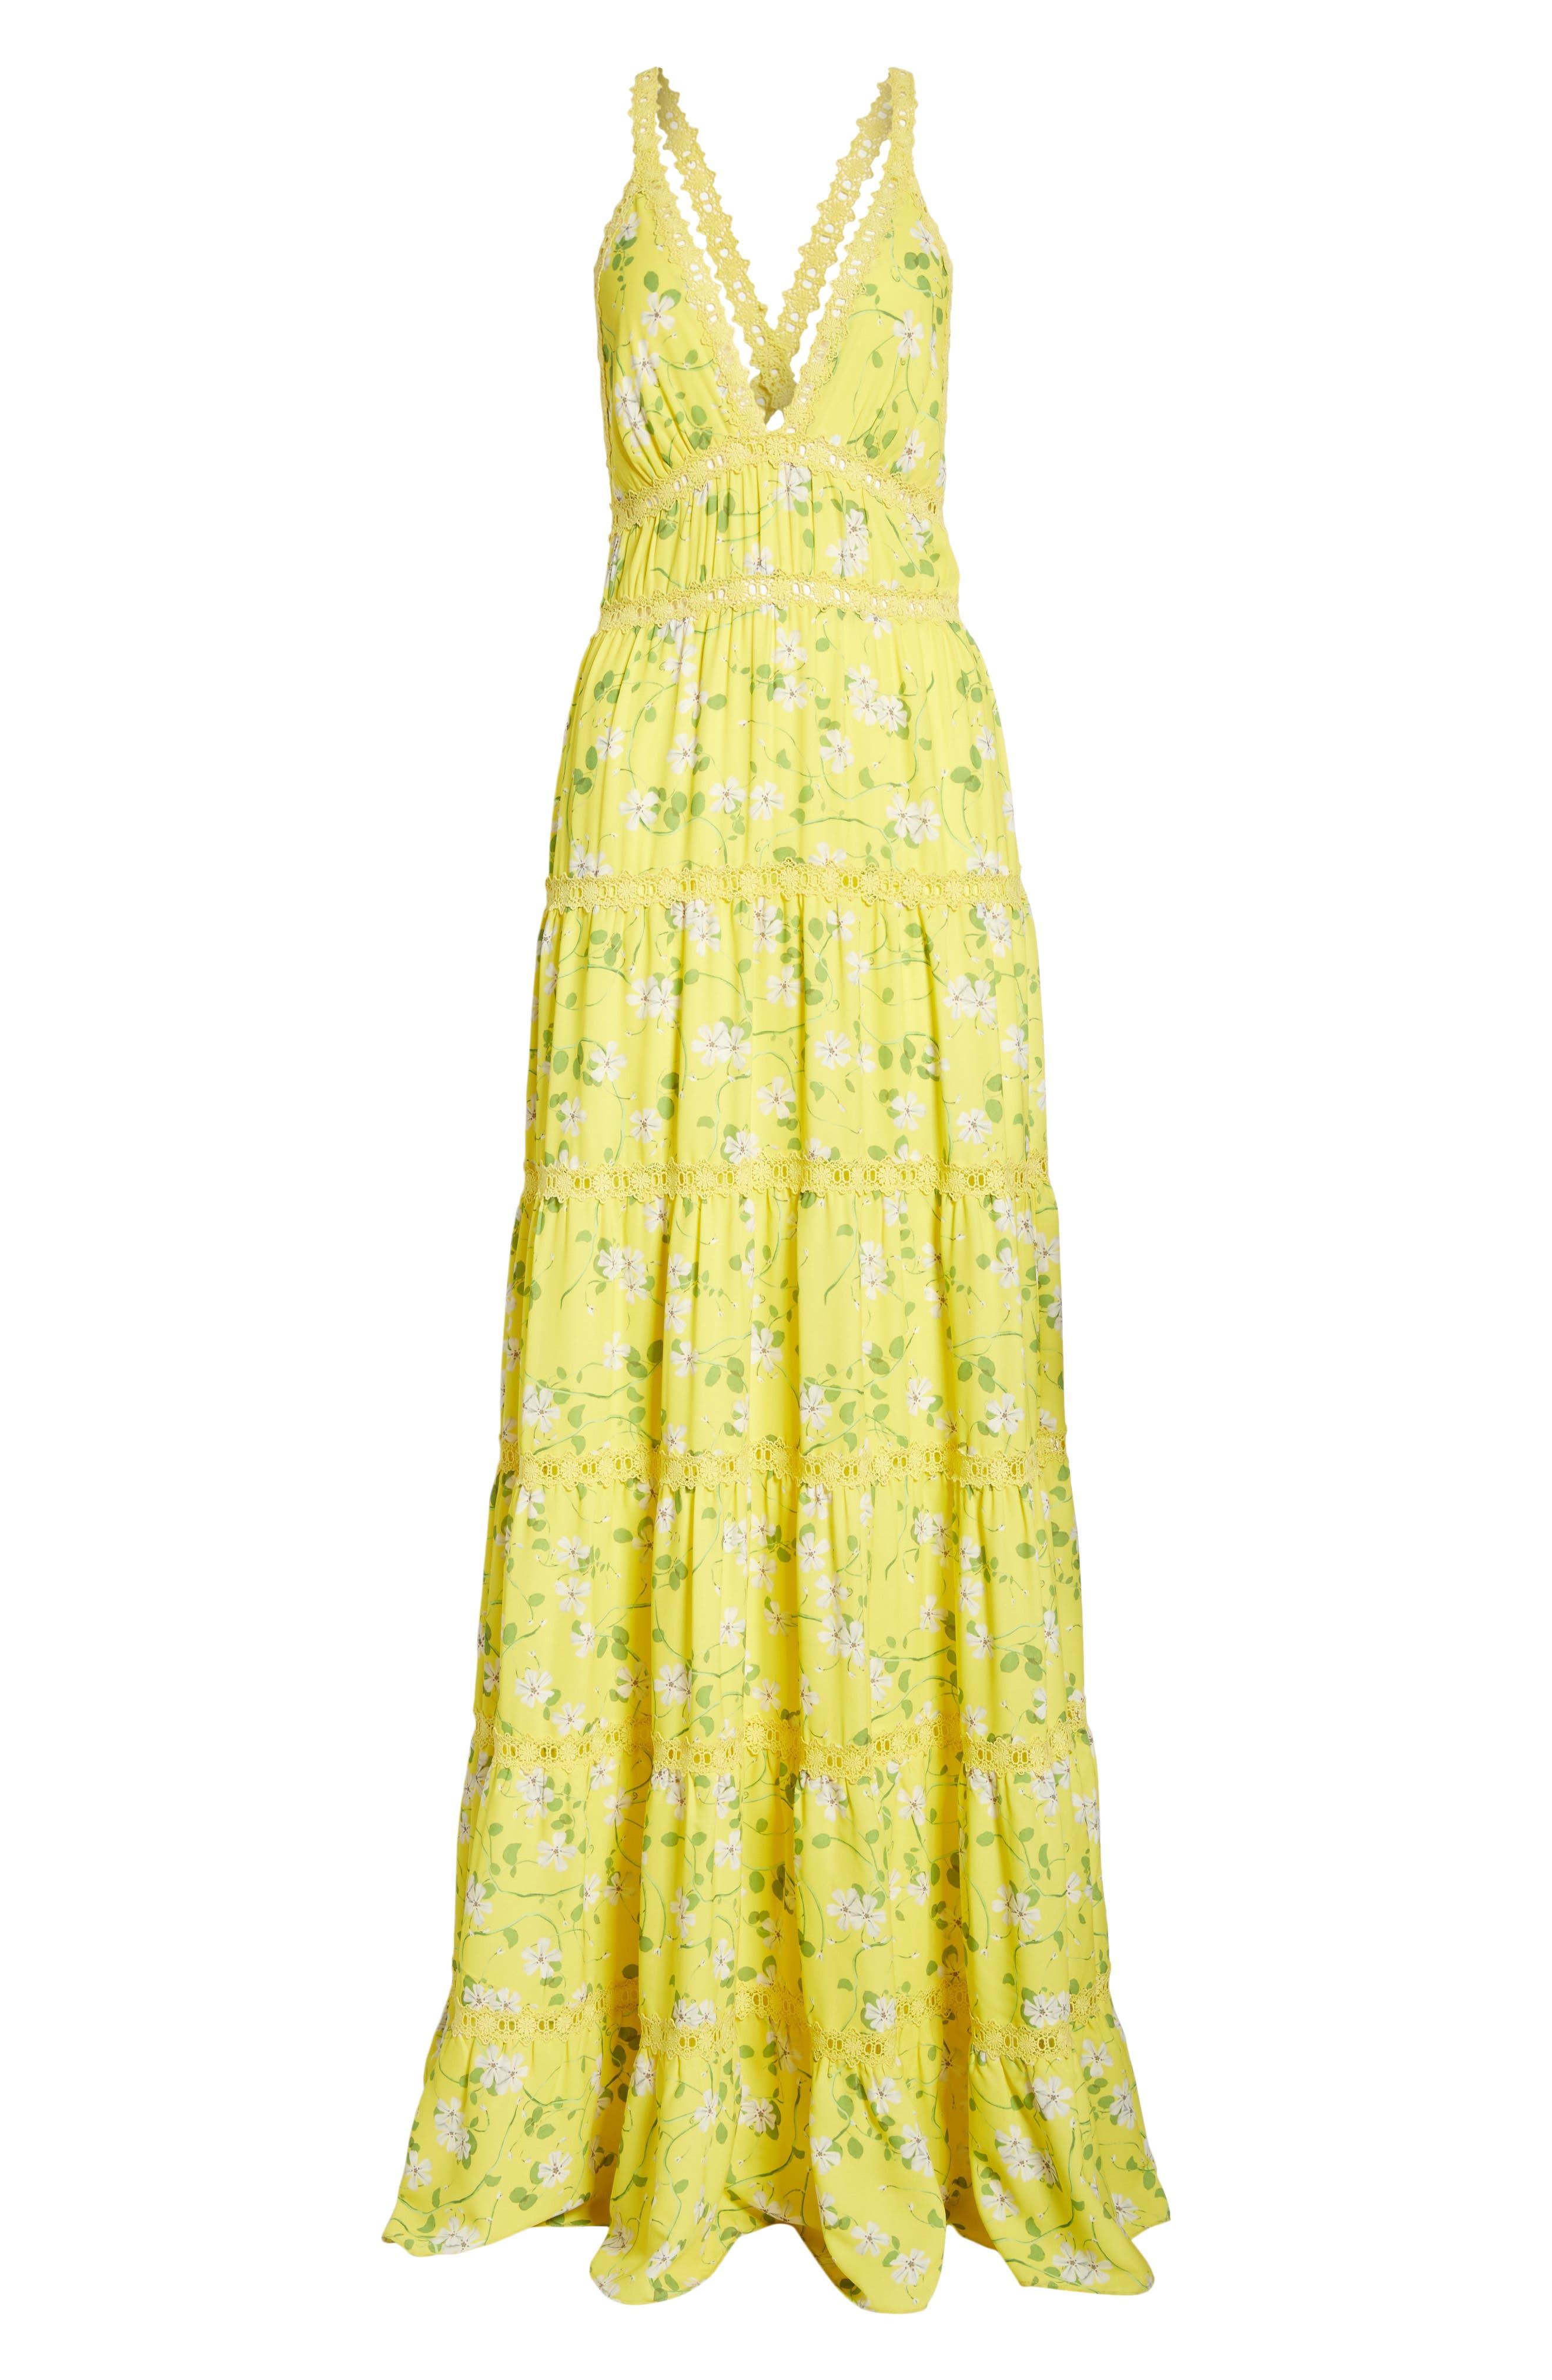 Karolina Print Maxi Dress,                             Alternate thumbnail 6, color,                             Spring Primrose-Lemon